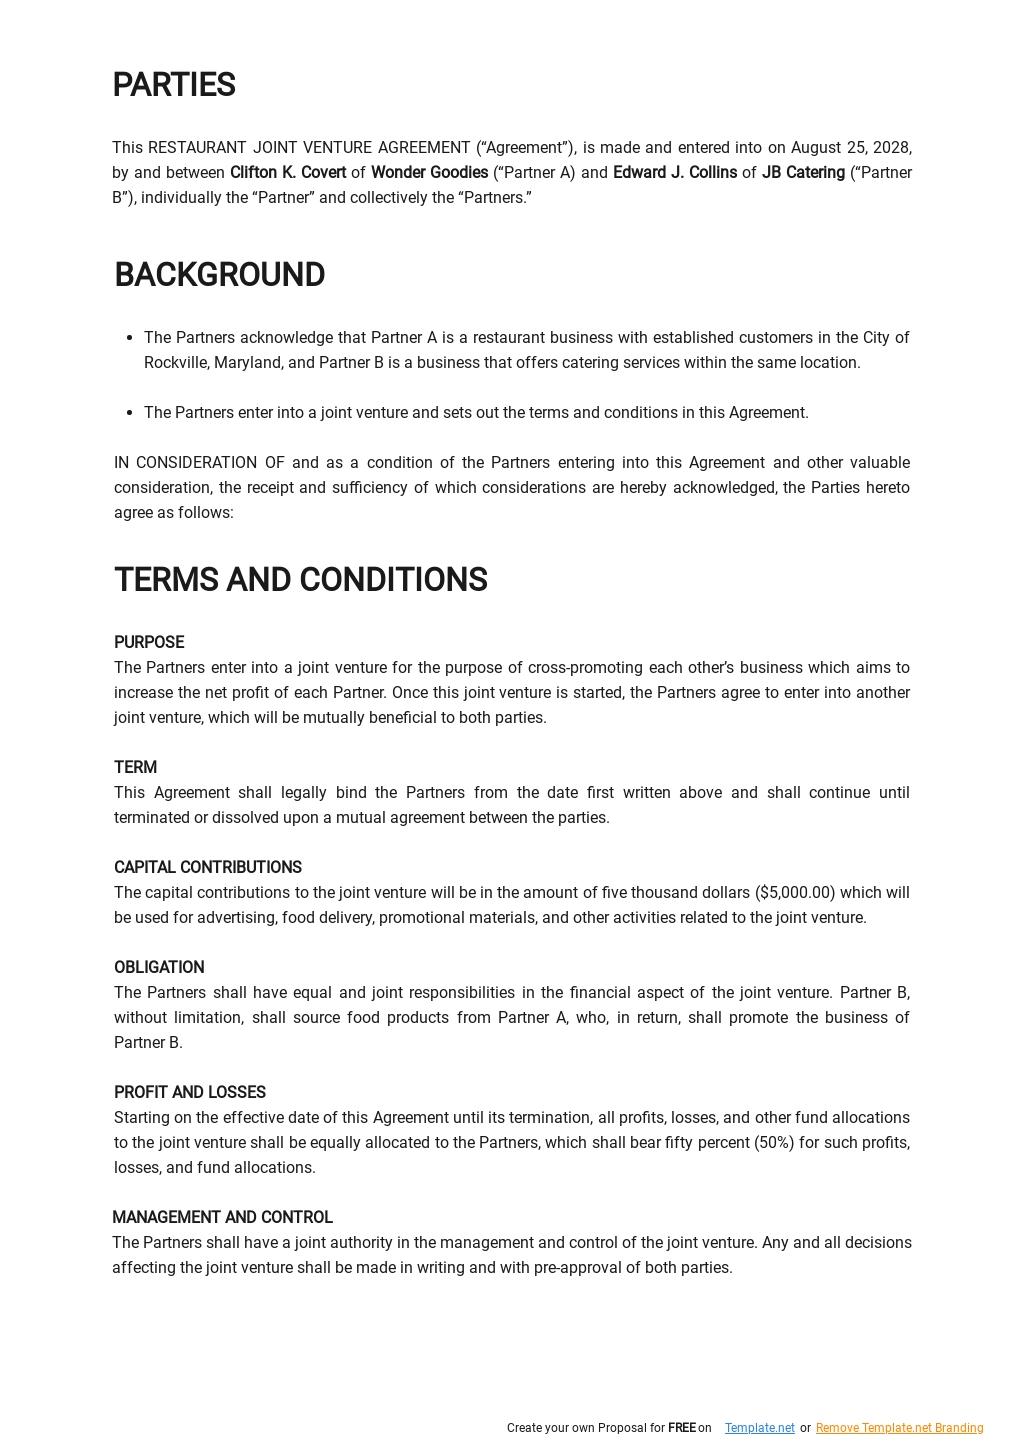 Restaurant Joint Venture Agreement Template 1.jpe